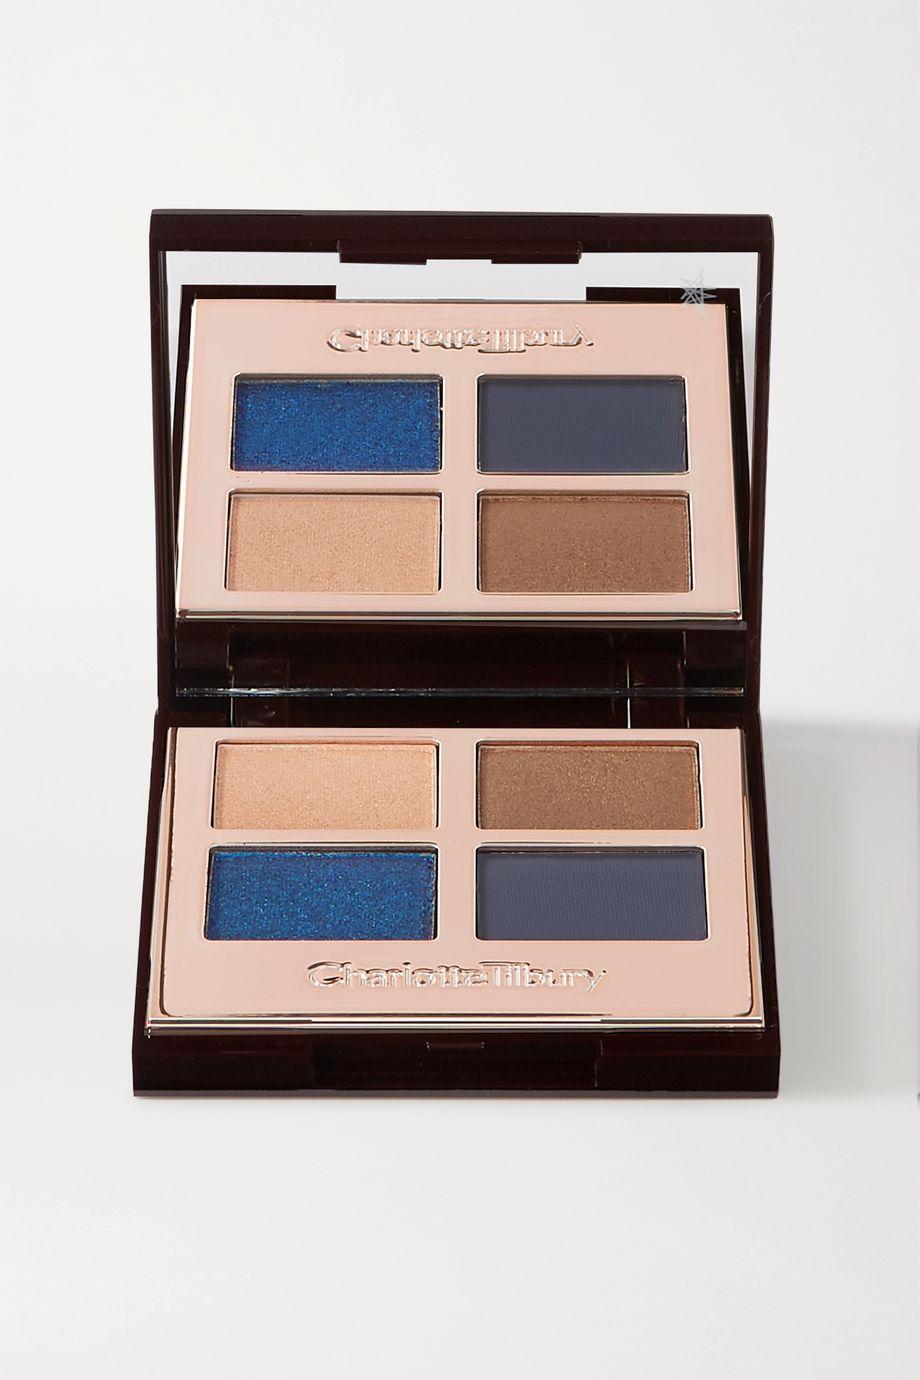 Charlotte Tilbury Luxury Palette Colour Coded Eye Shadow - Super Blue